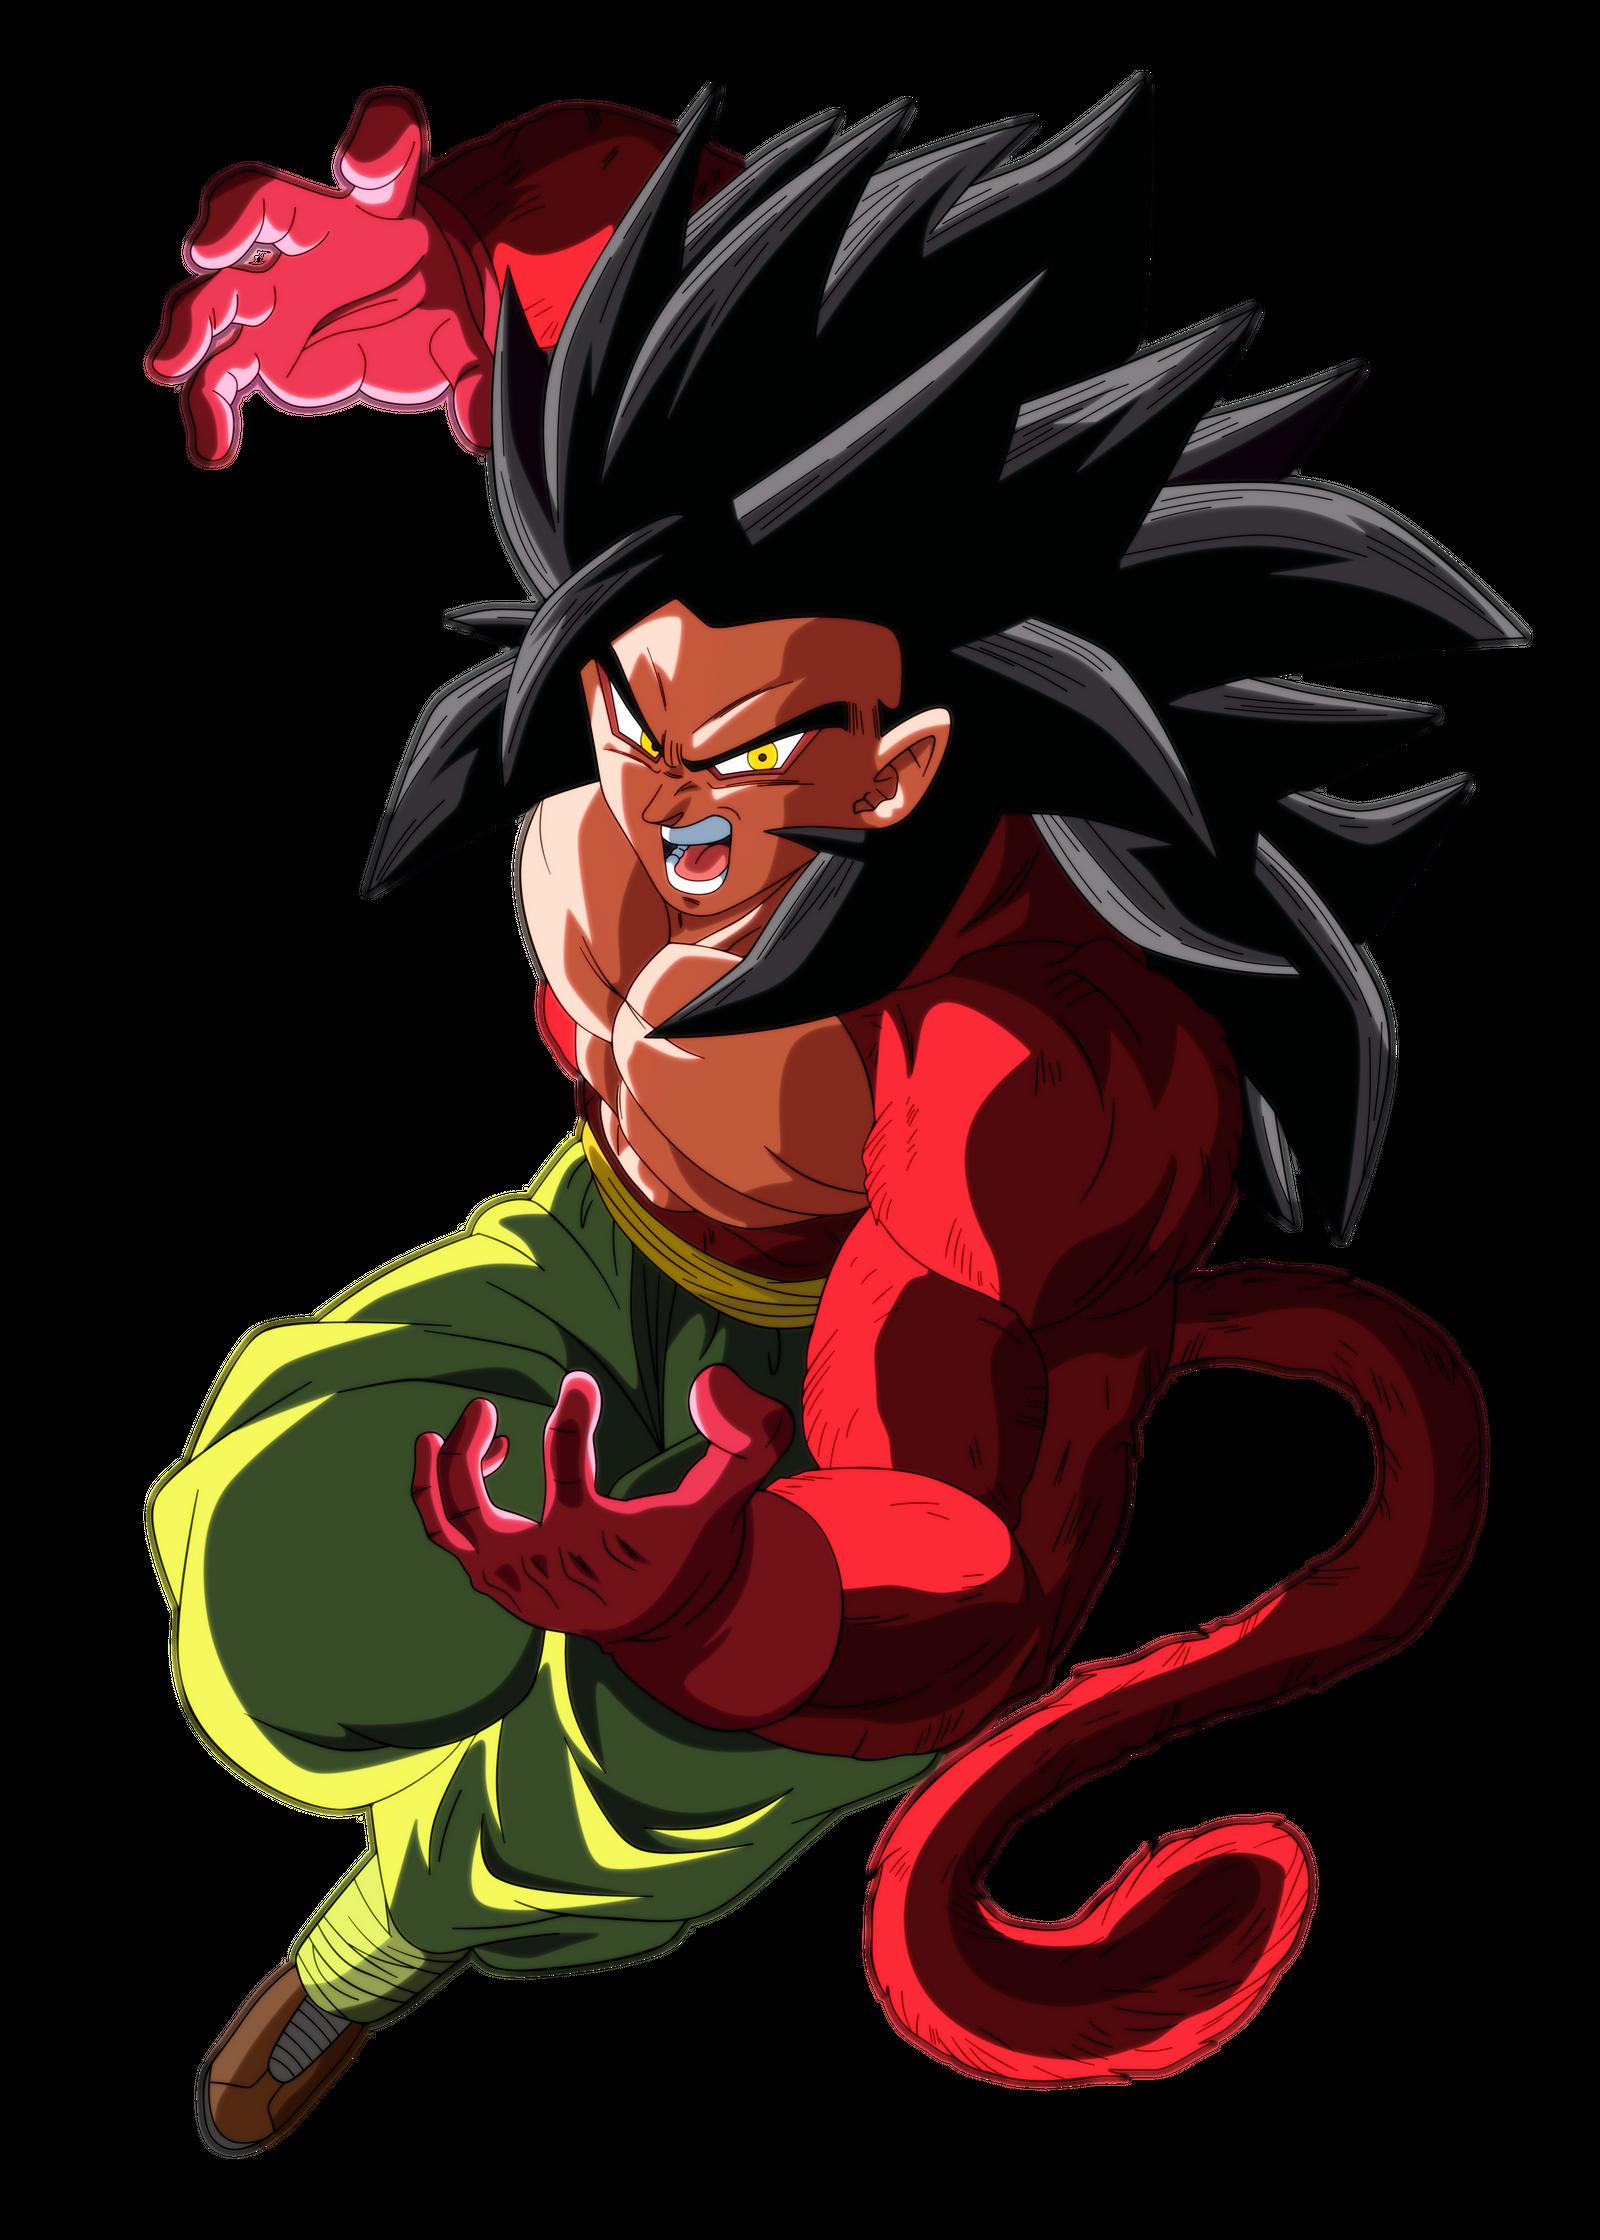 Gohan Xeno Ssj4 By Andrewdb13 On Deviantart Anime Dragon Ball Super Dragon Ball Super Manga Dragon Ball Super Art